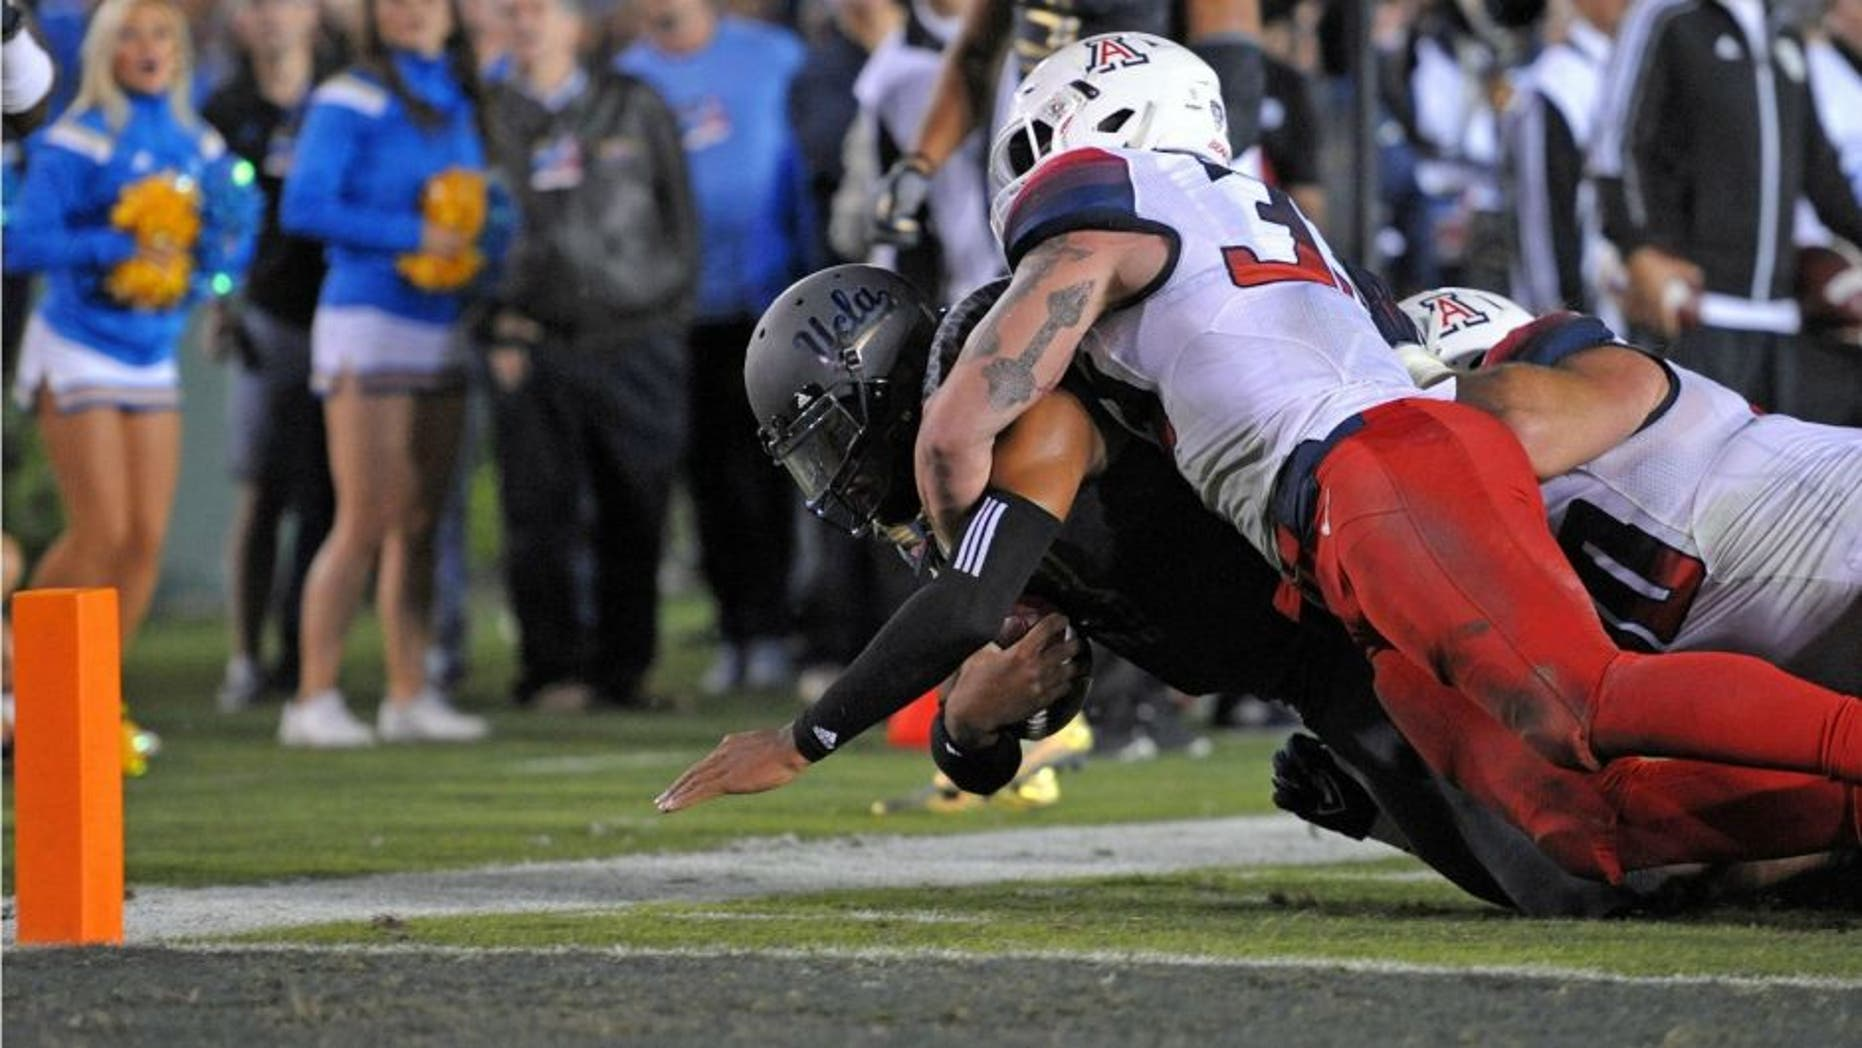 Nov 1, 2014; Pasadena, CA, USA; UCLA Bruins quarterback Brett Hundley (17) dives to the 2 yard line as Arizona Wildcats linebacker Scooby Wright III (33) brings him down during the second quarter at Rose Bowl. Mandatory Credit: Jake Roth-USA TODAY Sports